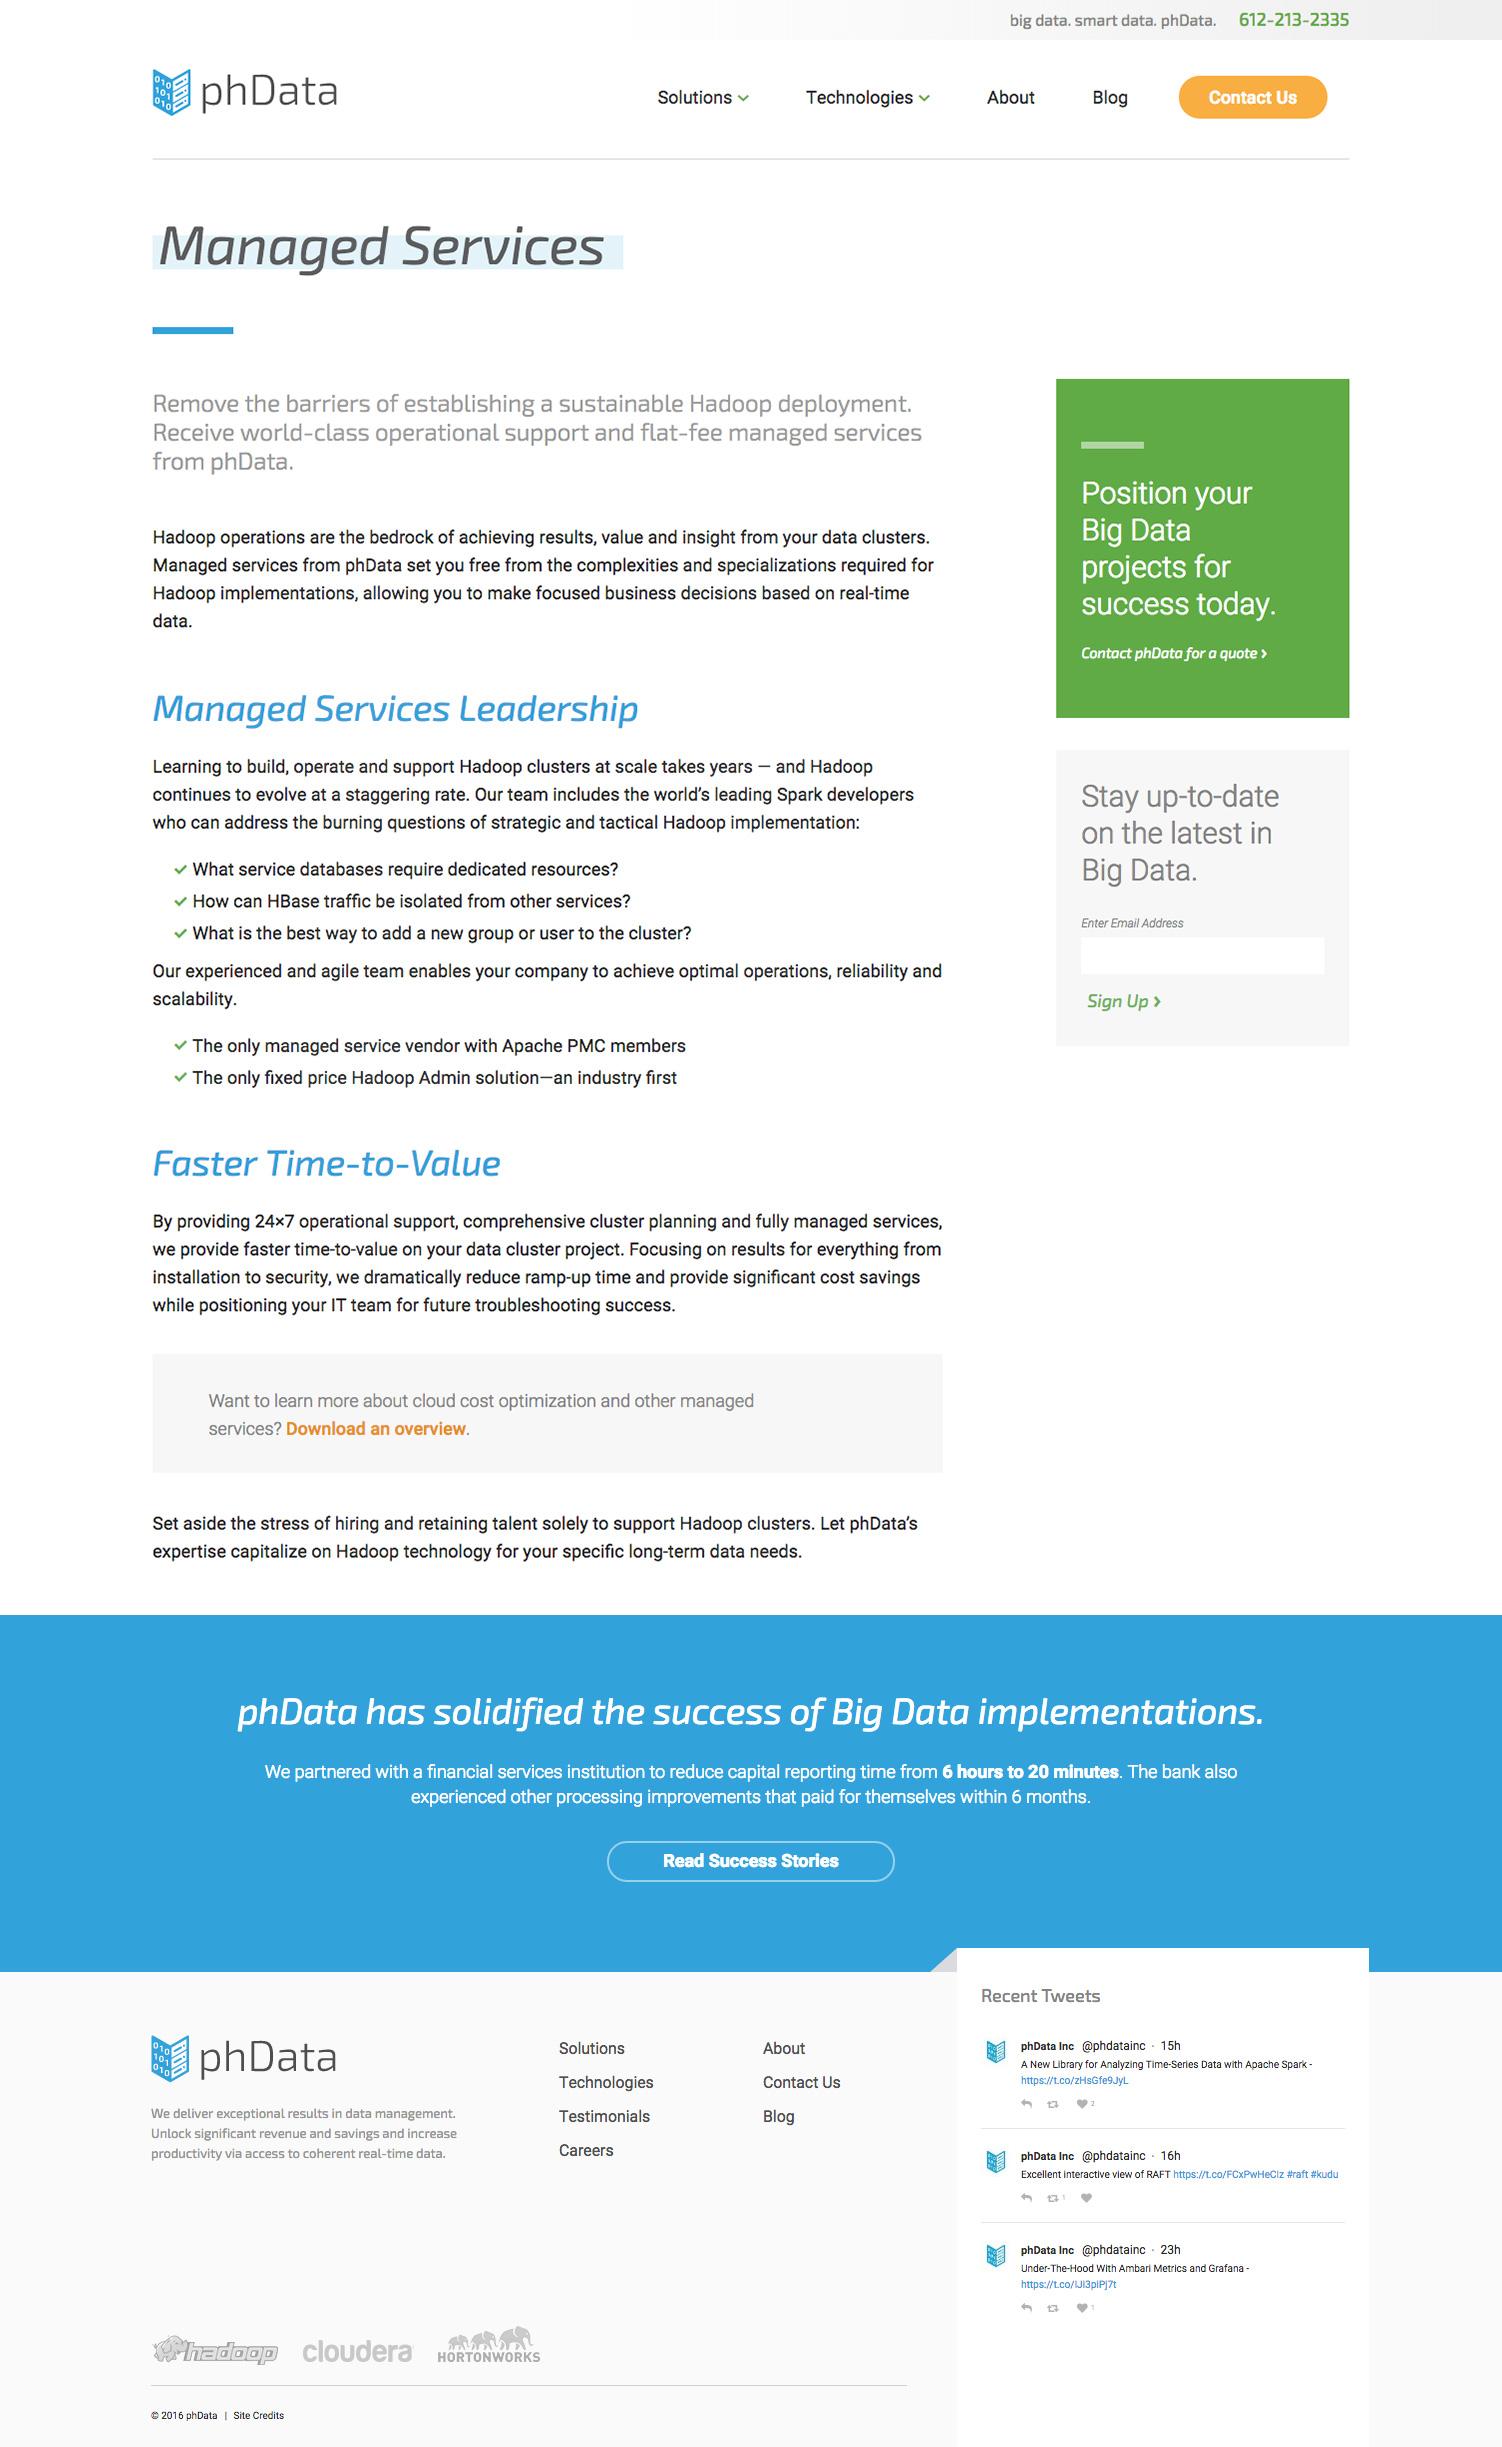 phData-by-karly-a-design_services.jpg